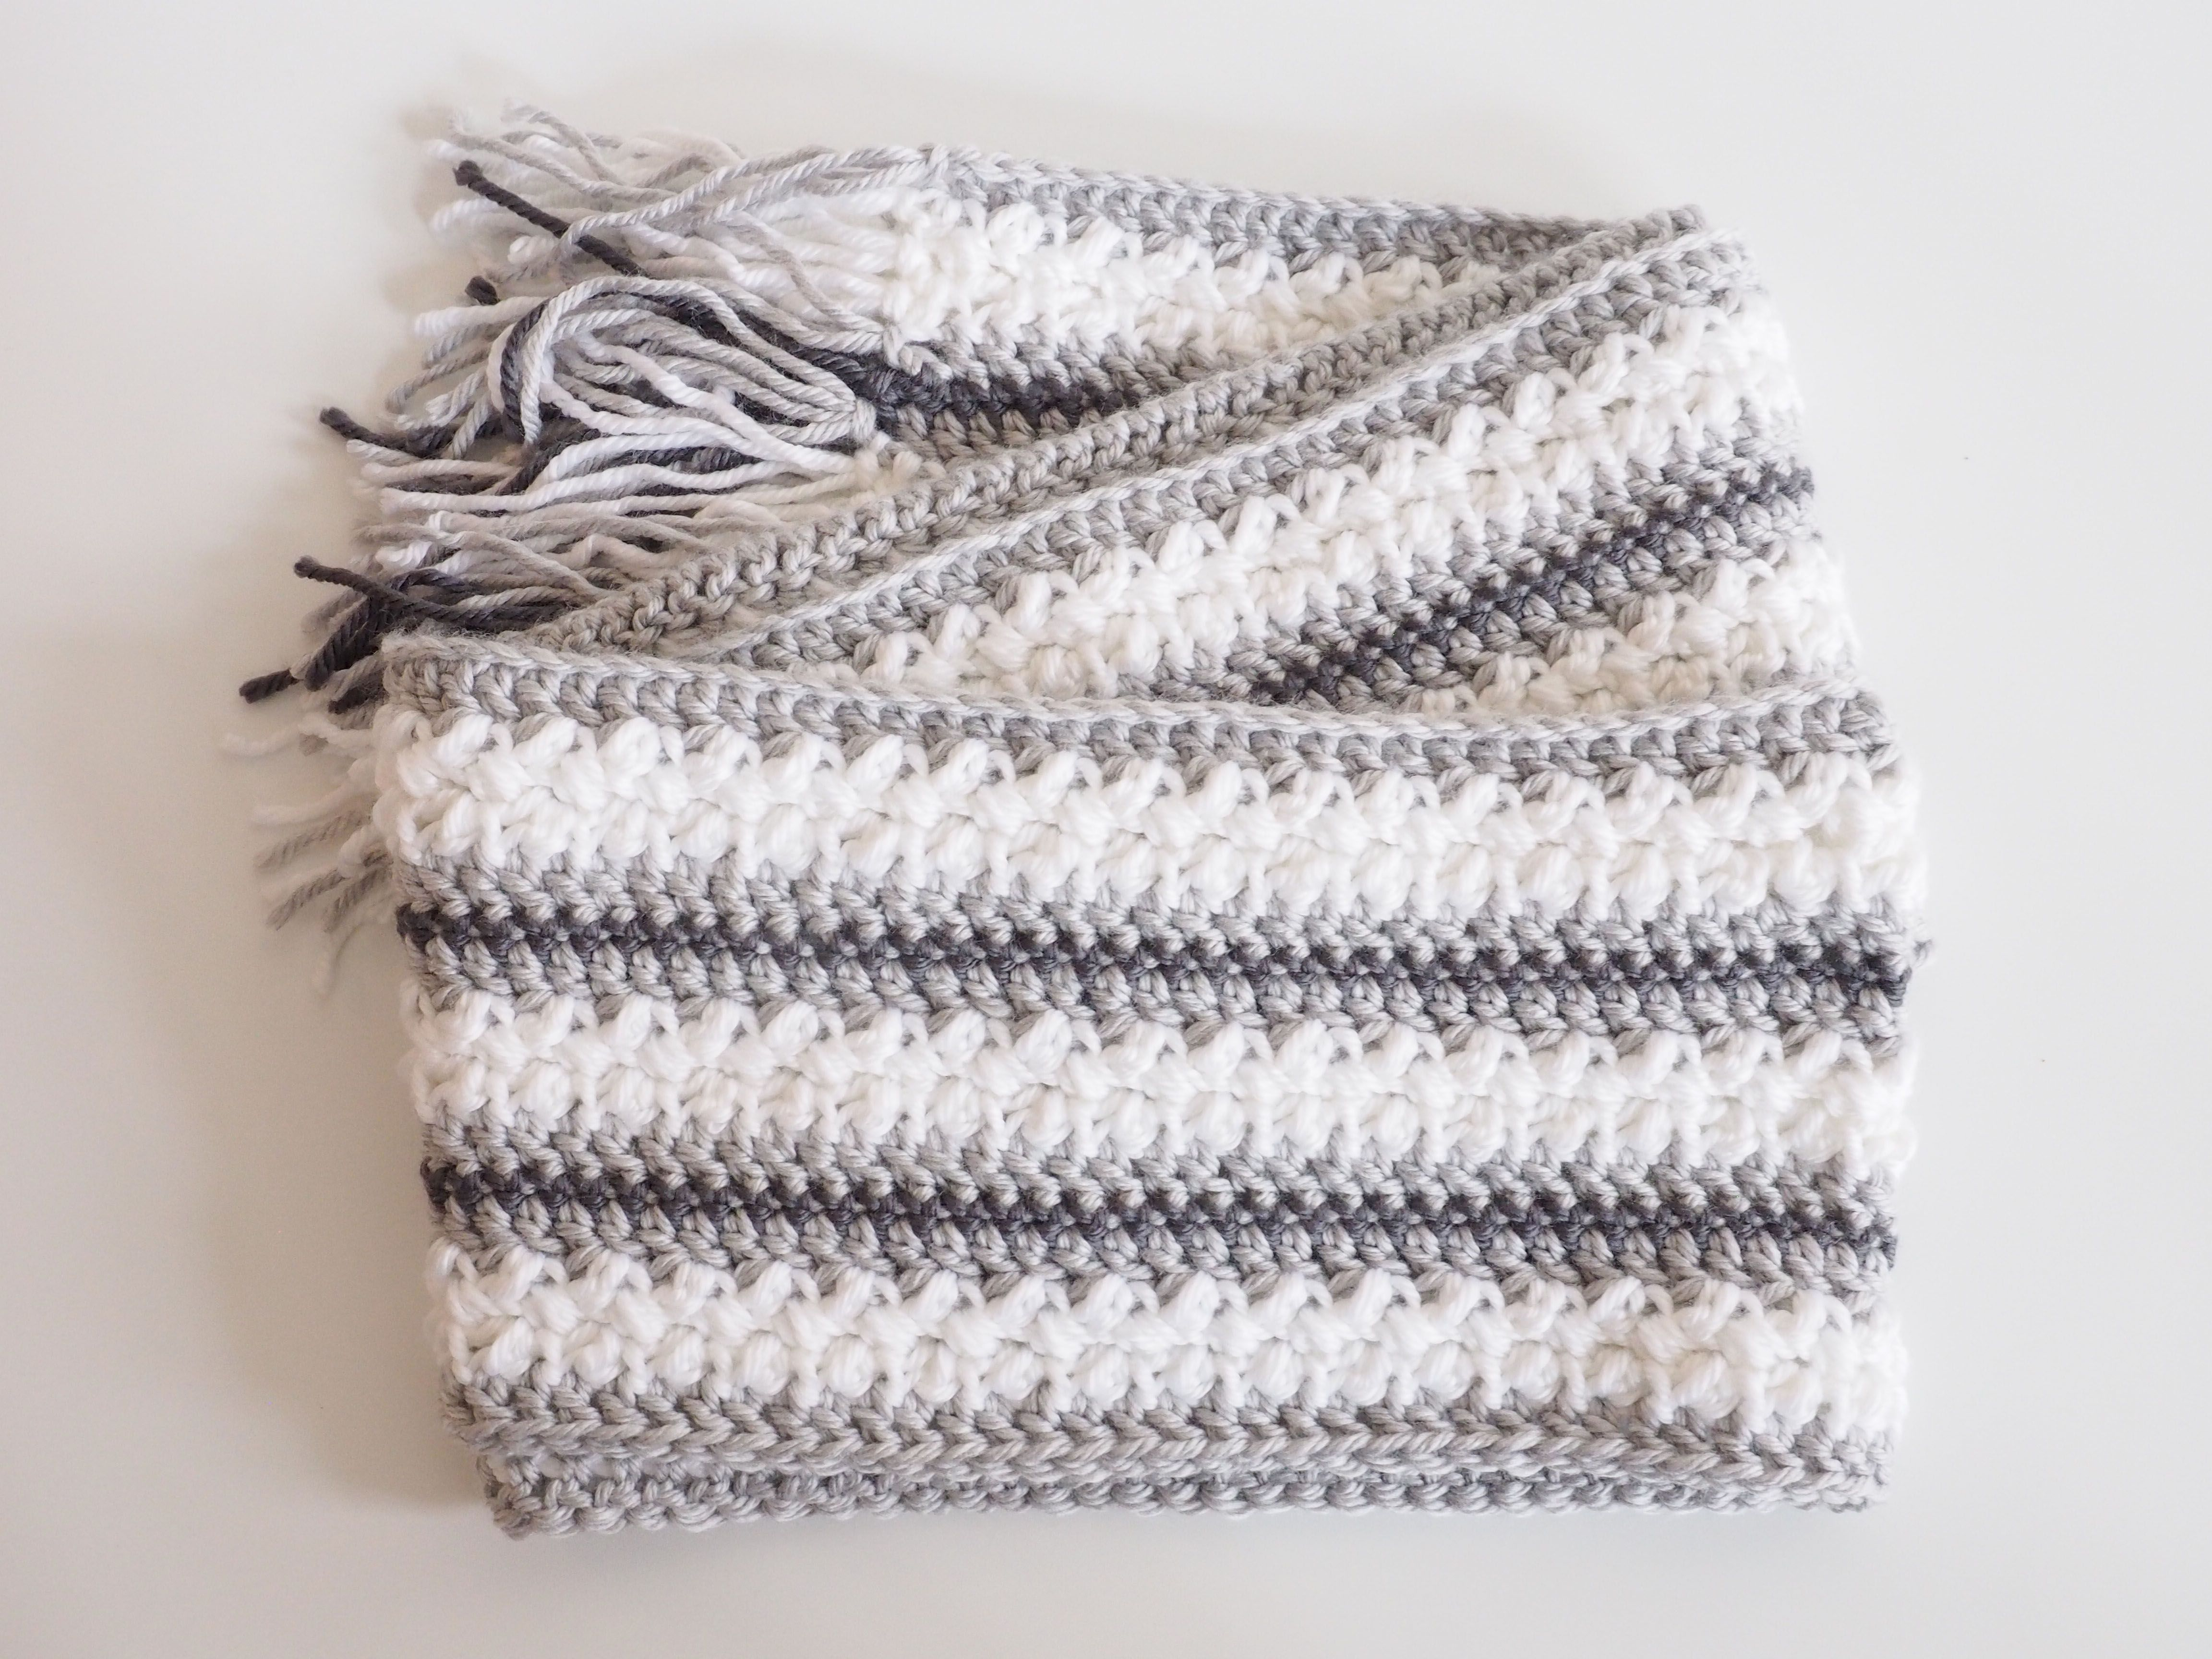 Winter Wonderland Crochet Scarf Pattern | Crochet scarf patterns ...